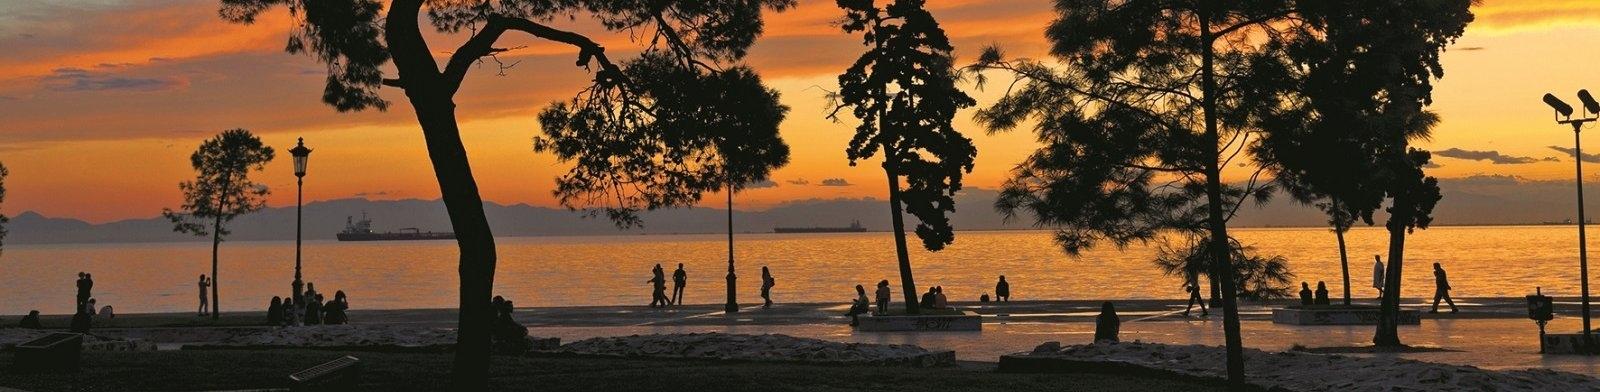 Thessaloniki waterfront at sunset